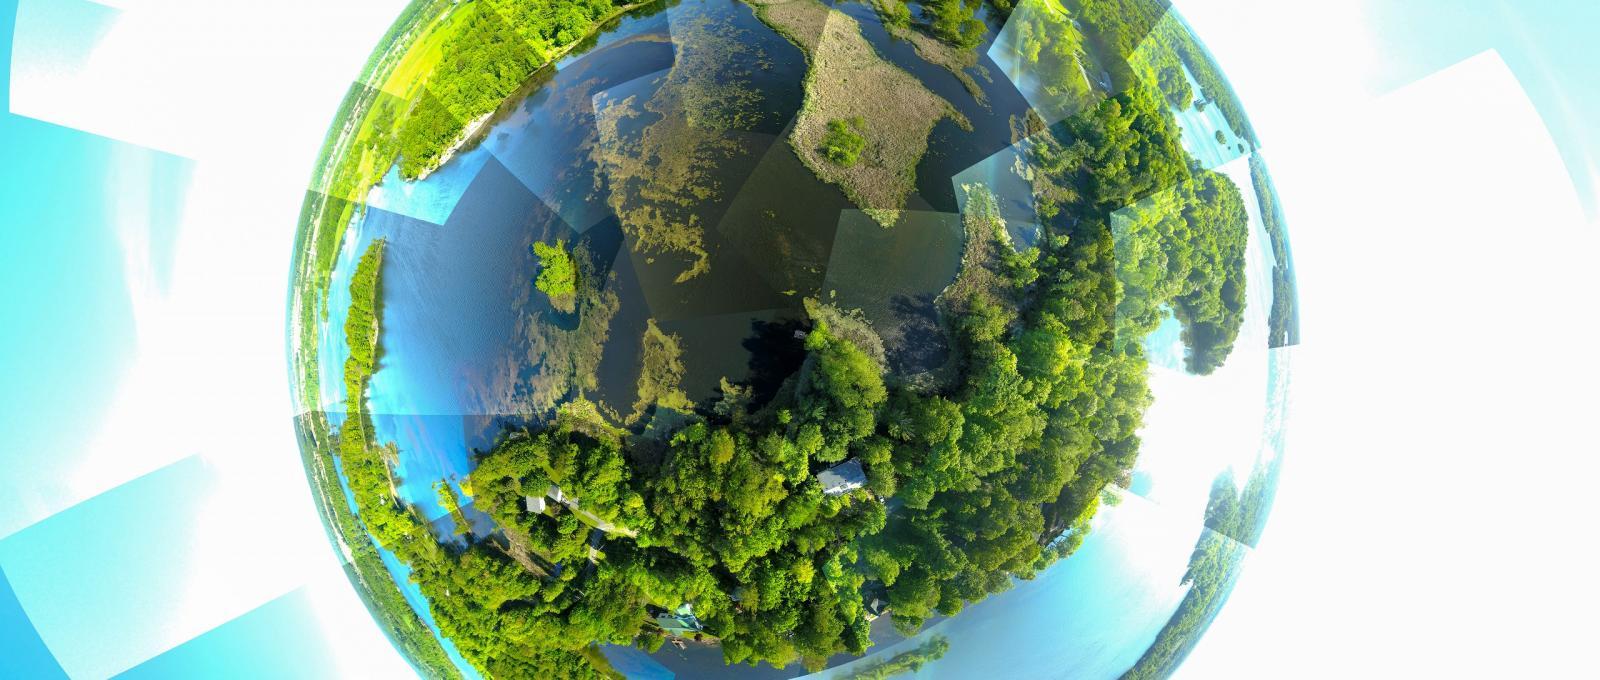 [Photograph using a fish eye lens of Milburn Bay, Dog Lake]